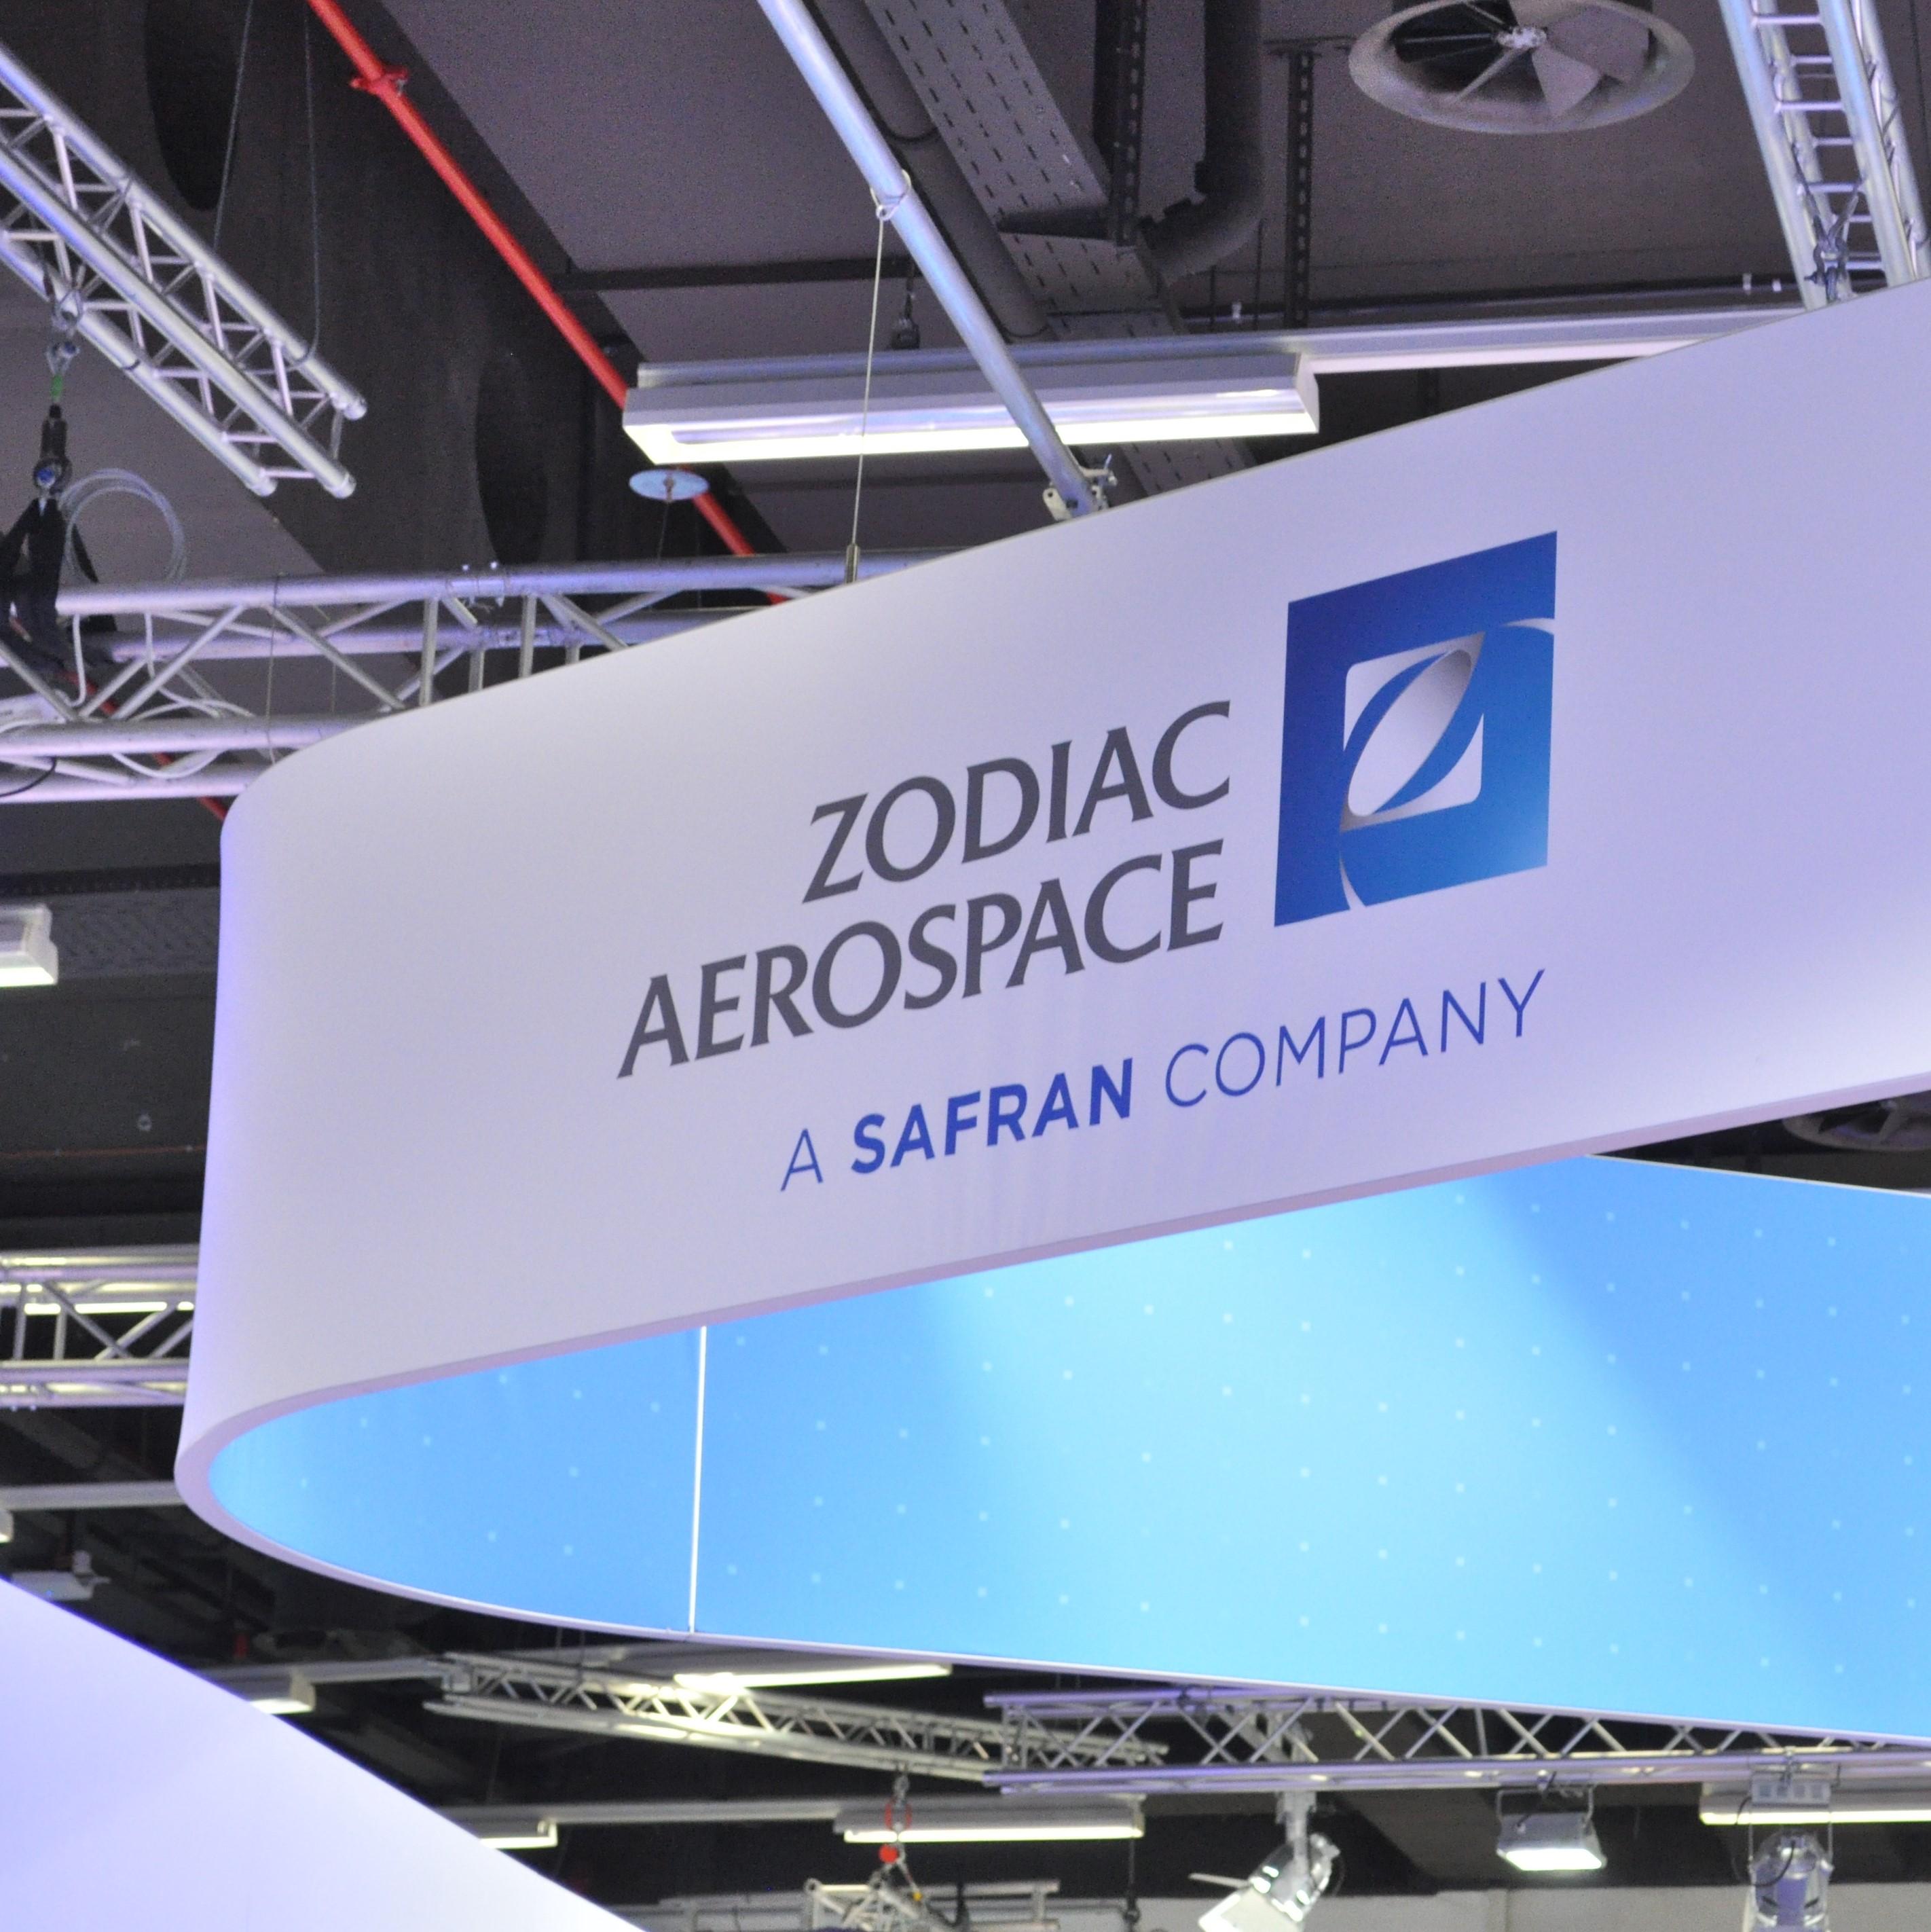 zodiac-aerospace-safran